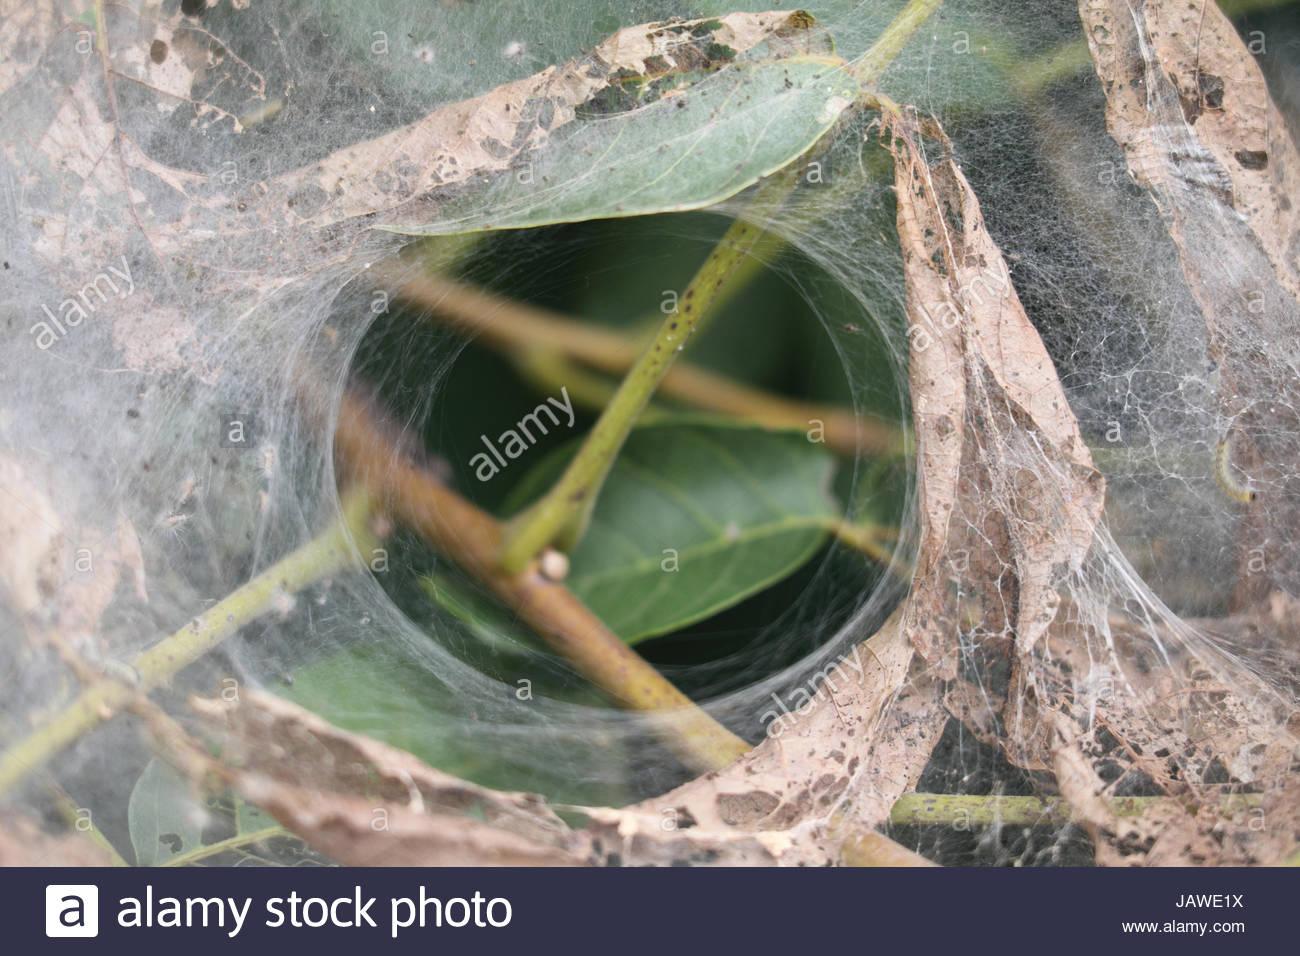 Fall webworm, Hyphantria cunea, create a webbed nests in a walnut tree, Juglans regia. - Stock Image